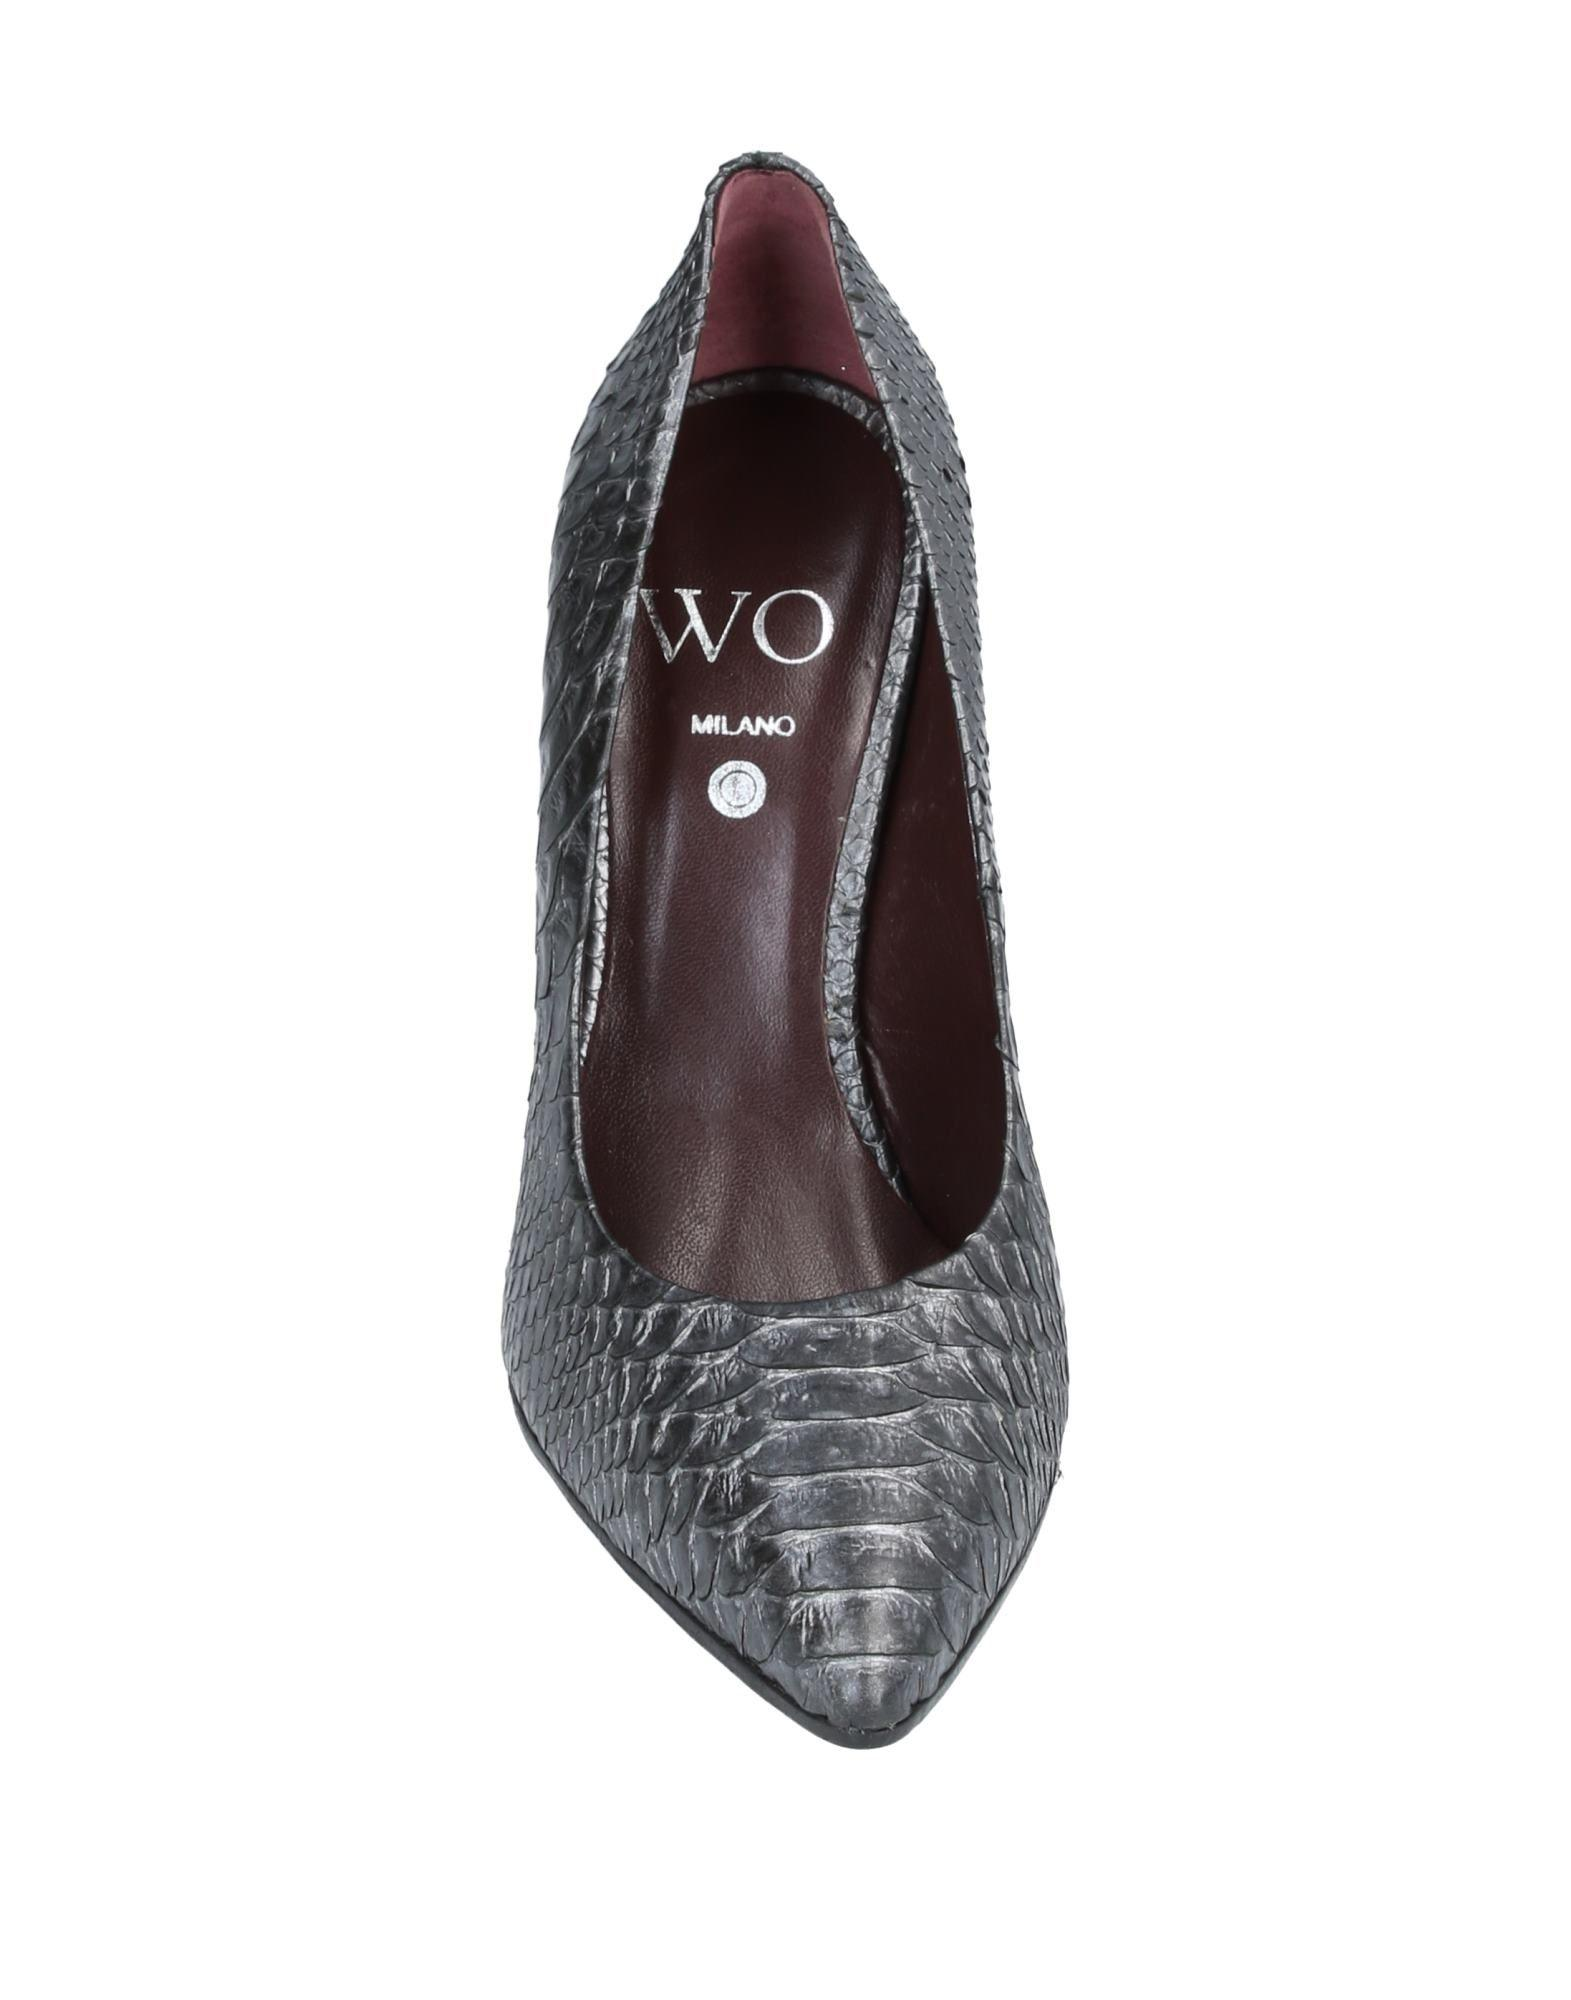 Zapatos de salón Wo Milano de Cuero